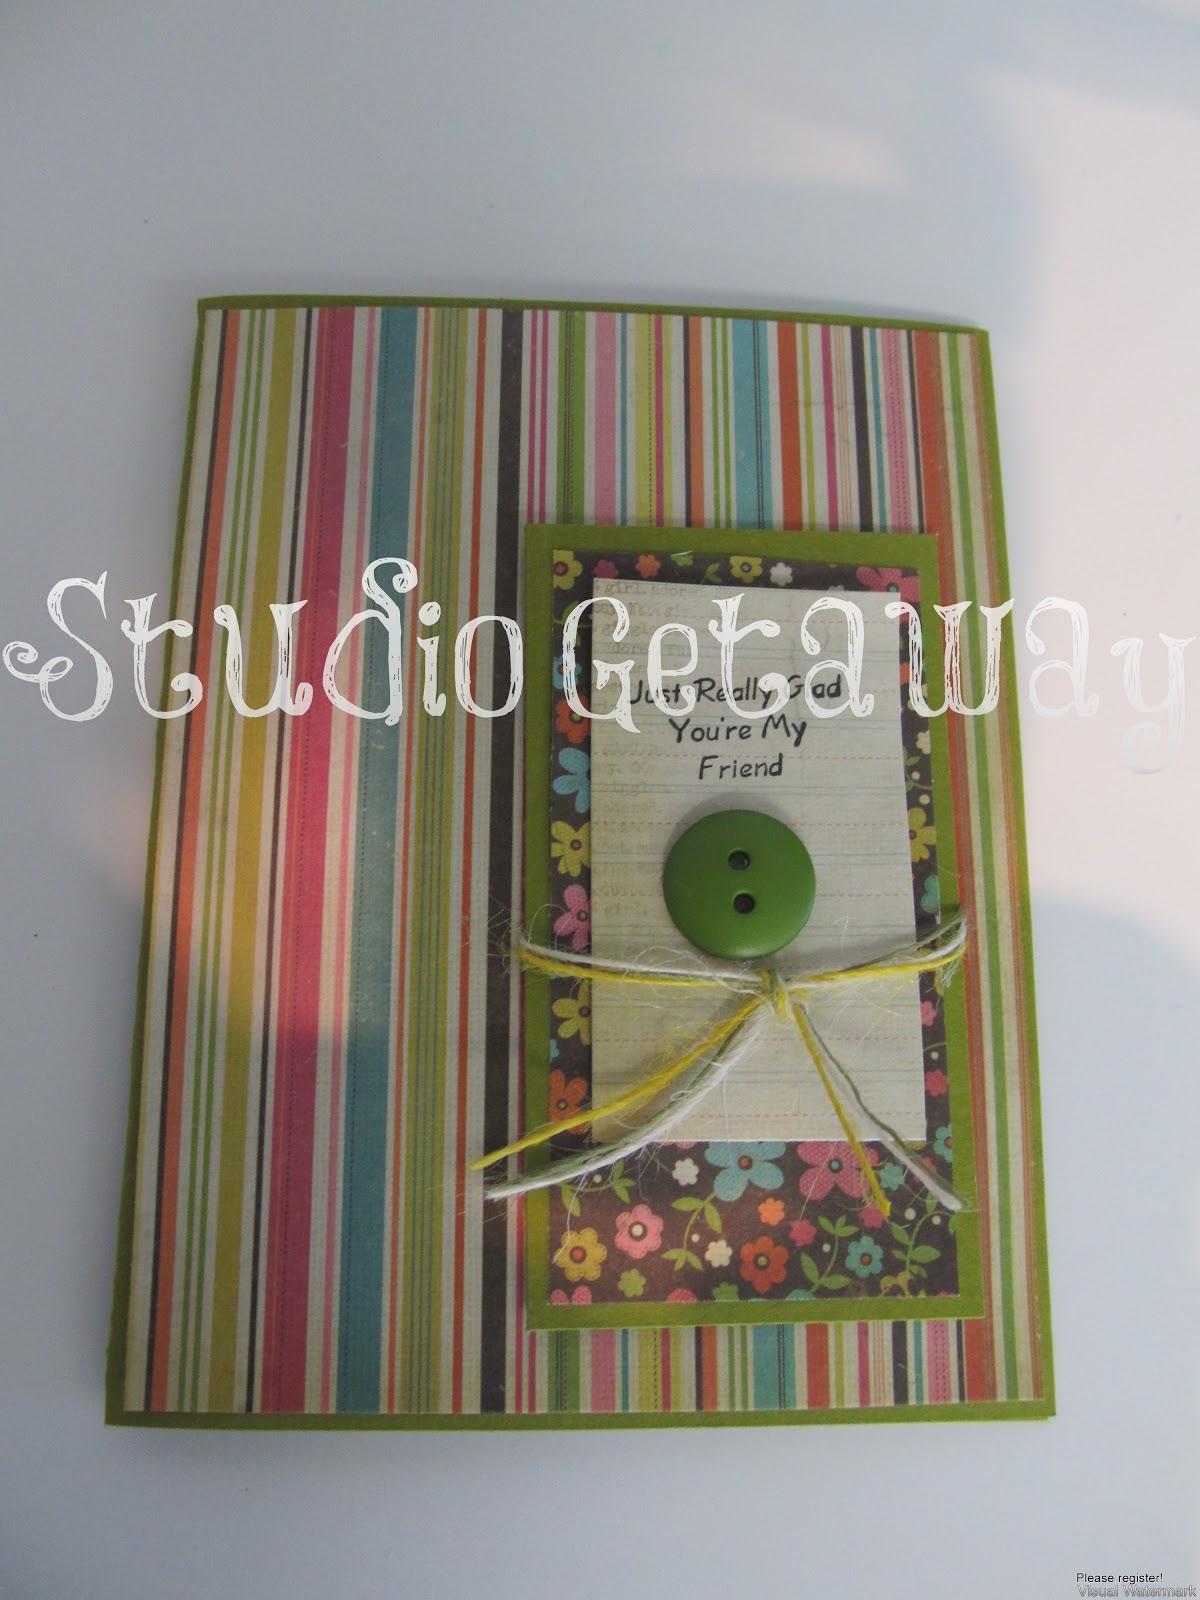 January scrapbook ideas - Cards And Scrapbook Ideas From January Retreat